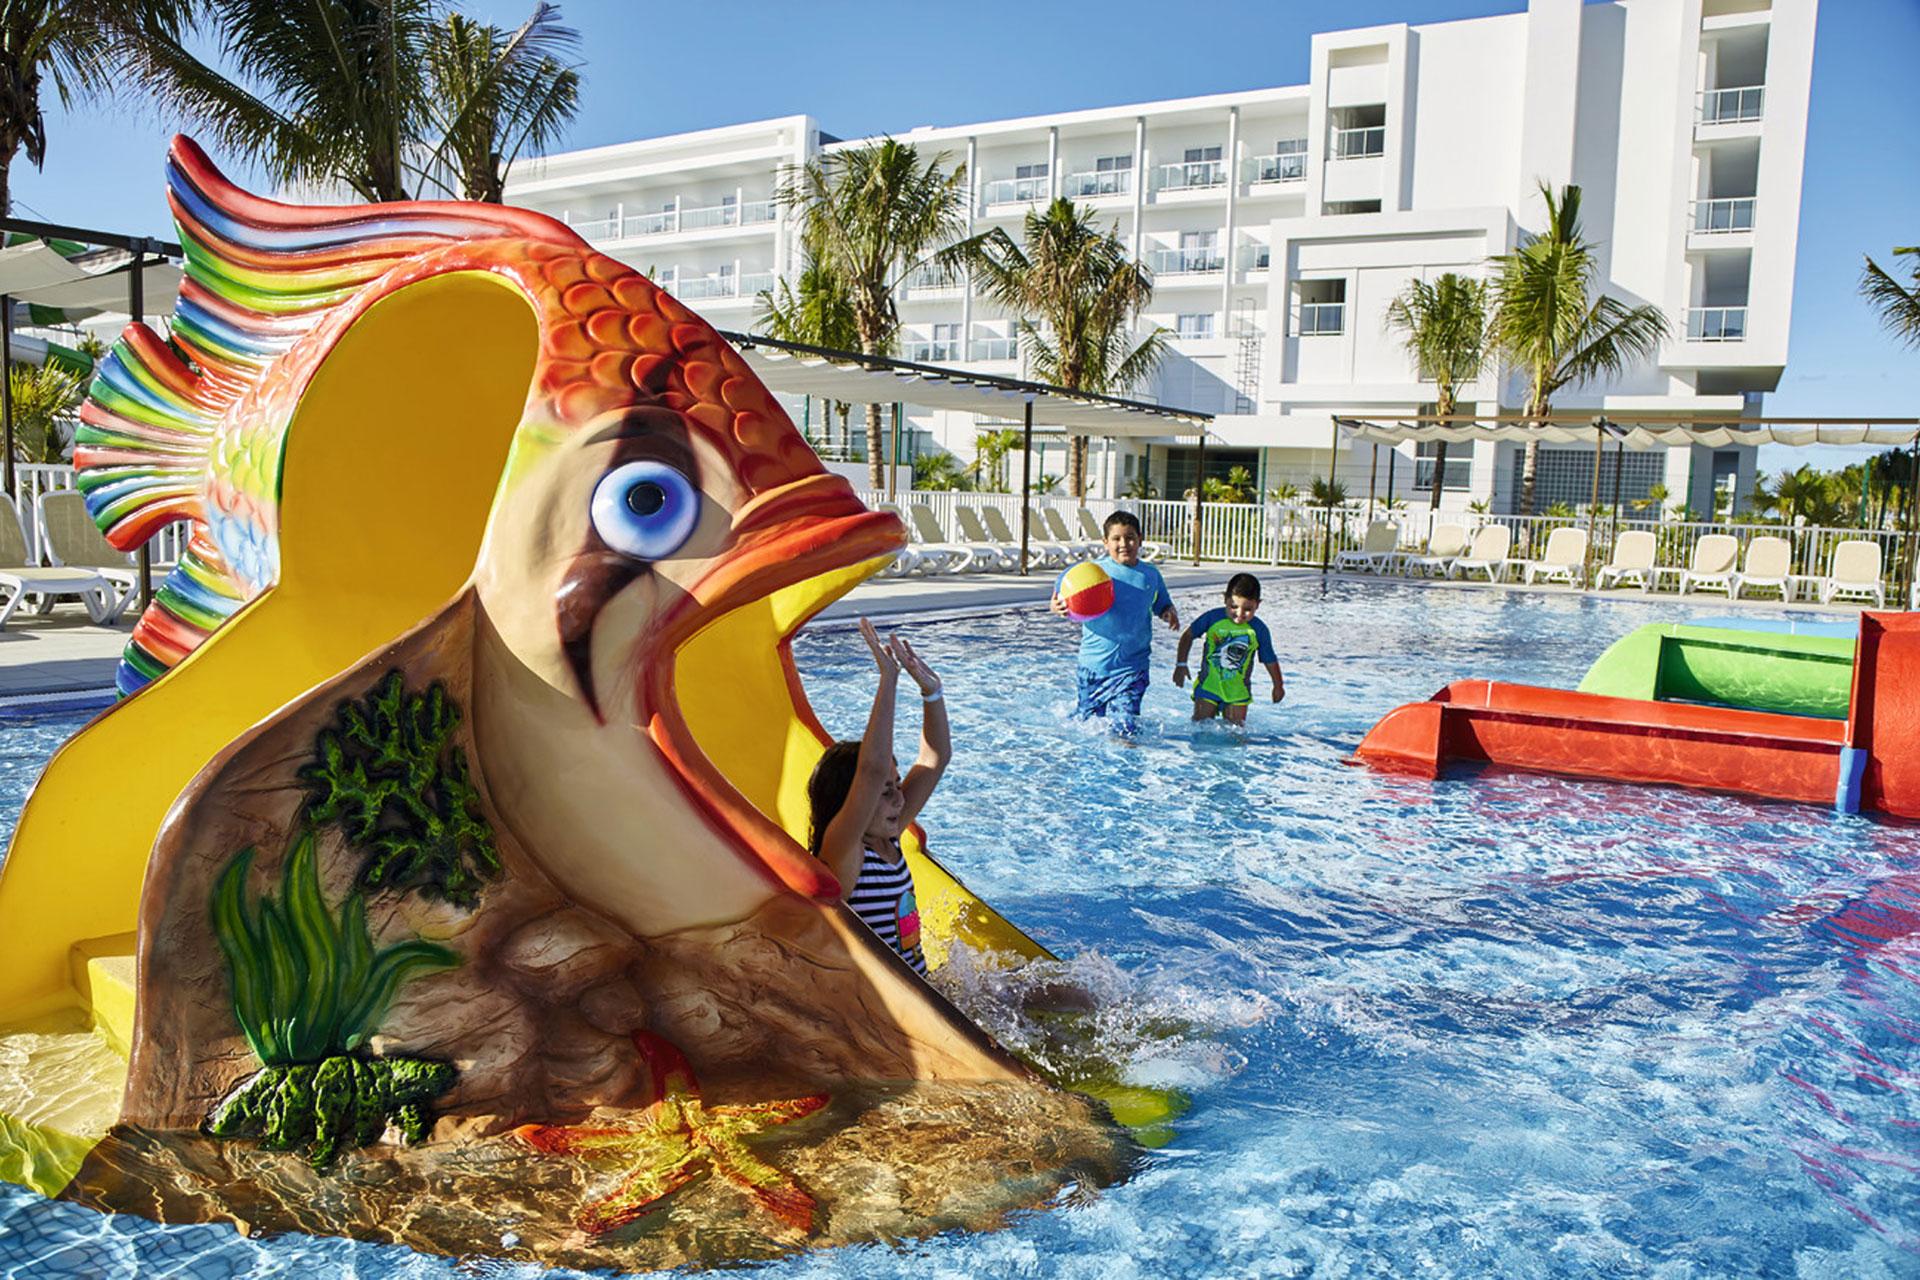 Kids' Pool at Hotel Riu Dunamar in Cancun, Mexico; Courtesy of Hotel Riu Dunamar